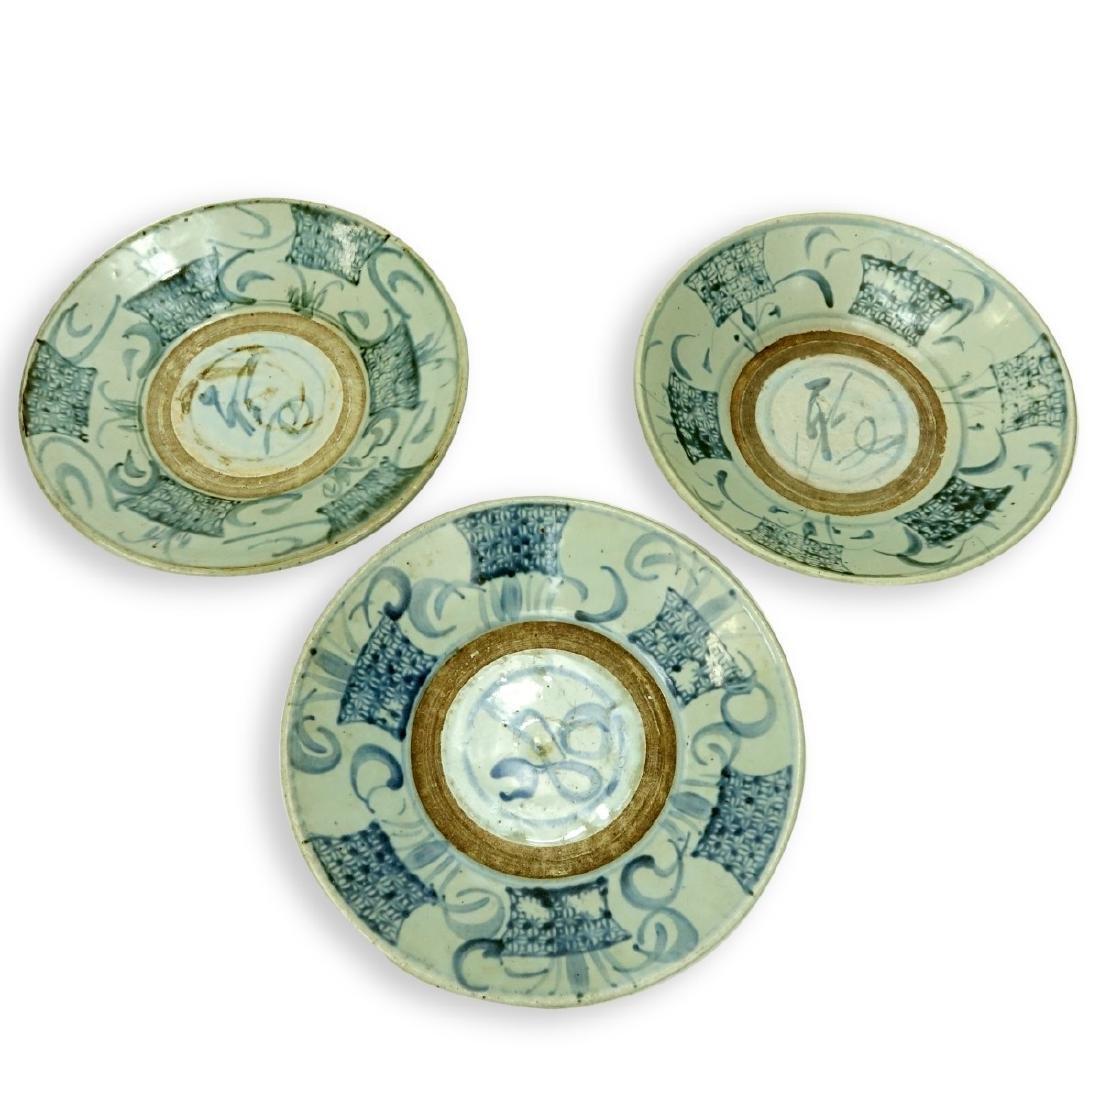 Three (3) Antique Chinese Ceramic Bowls